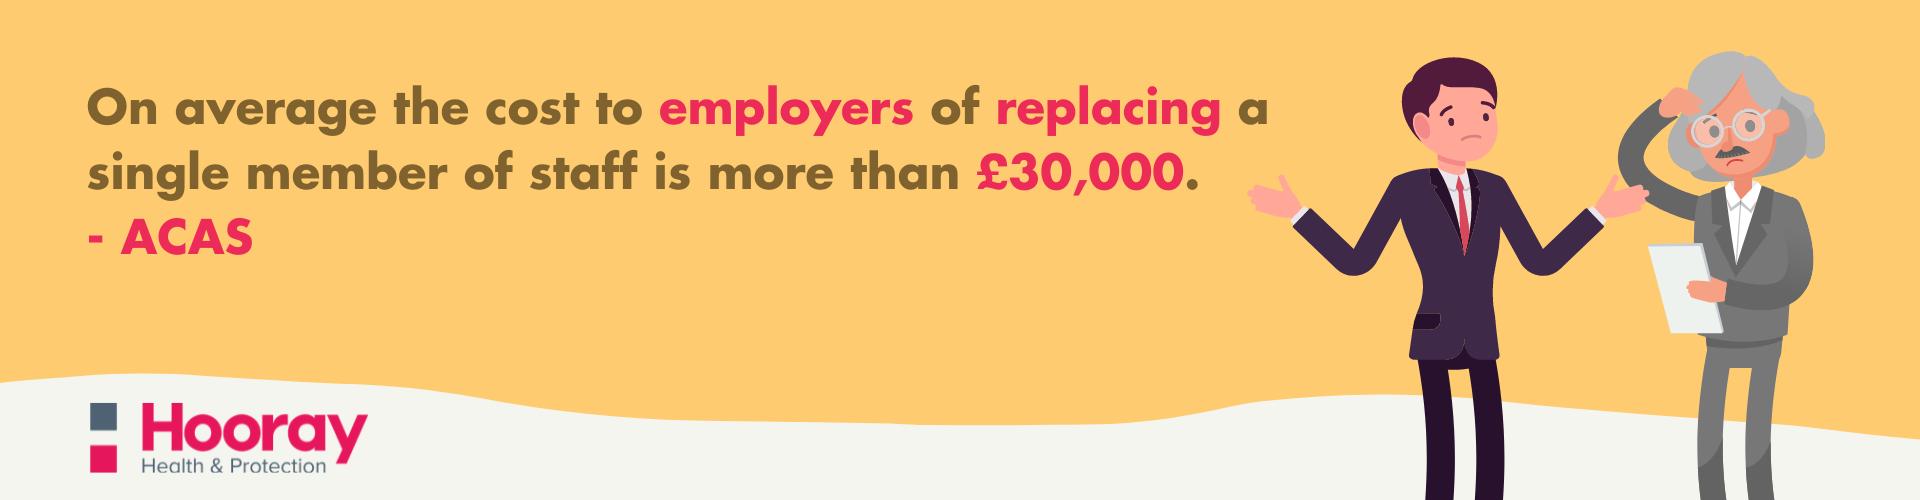 Hiring New Staff Employee Benefits